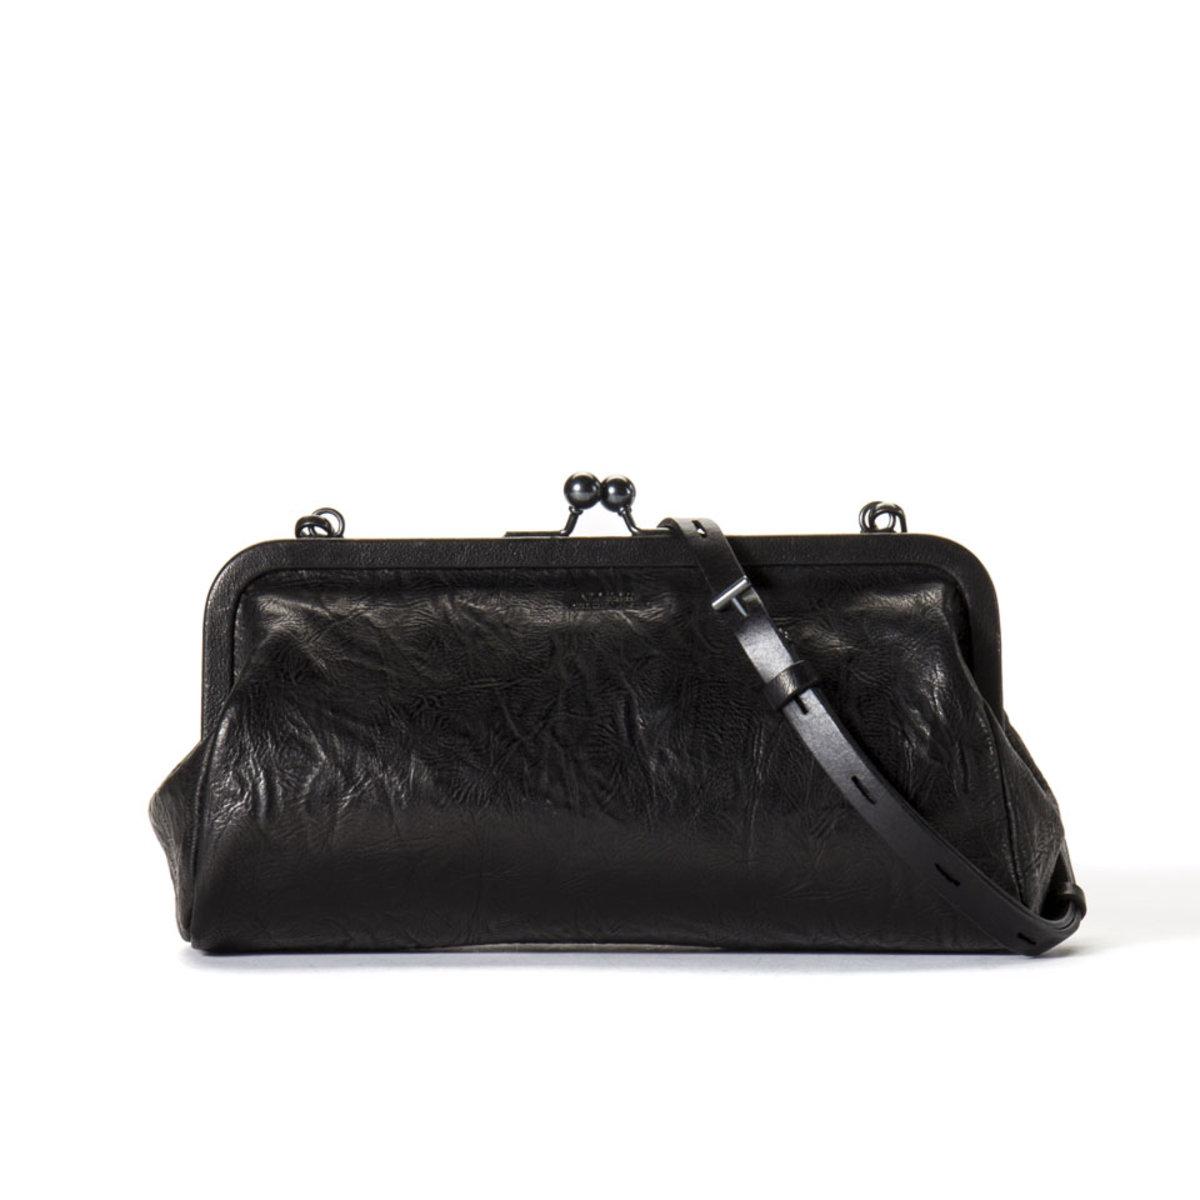 TOUGH Jeansmith   Leather Bag-Black   HKTVmall Online Shopping d55e6175b6